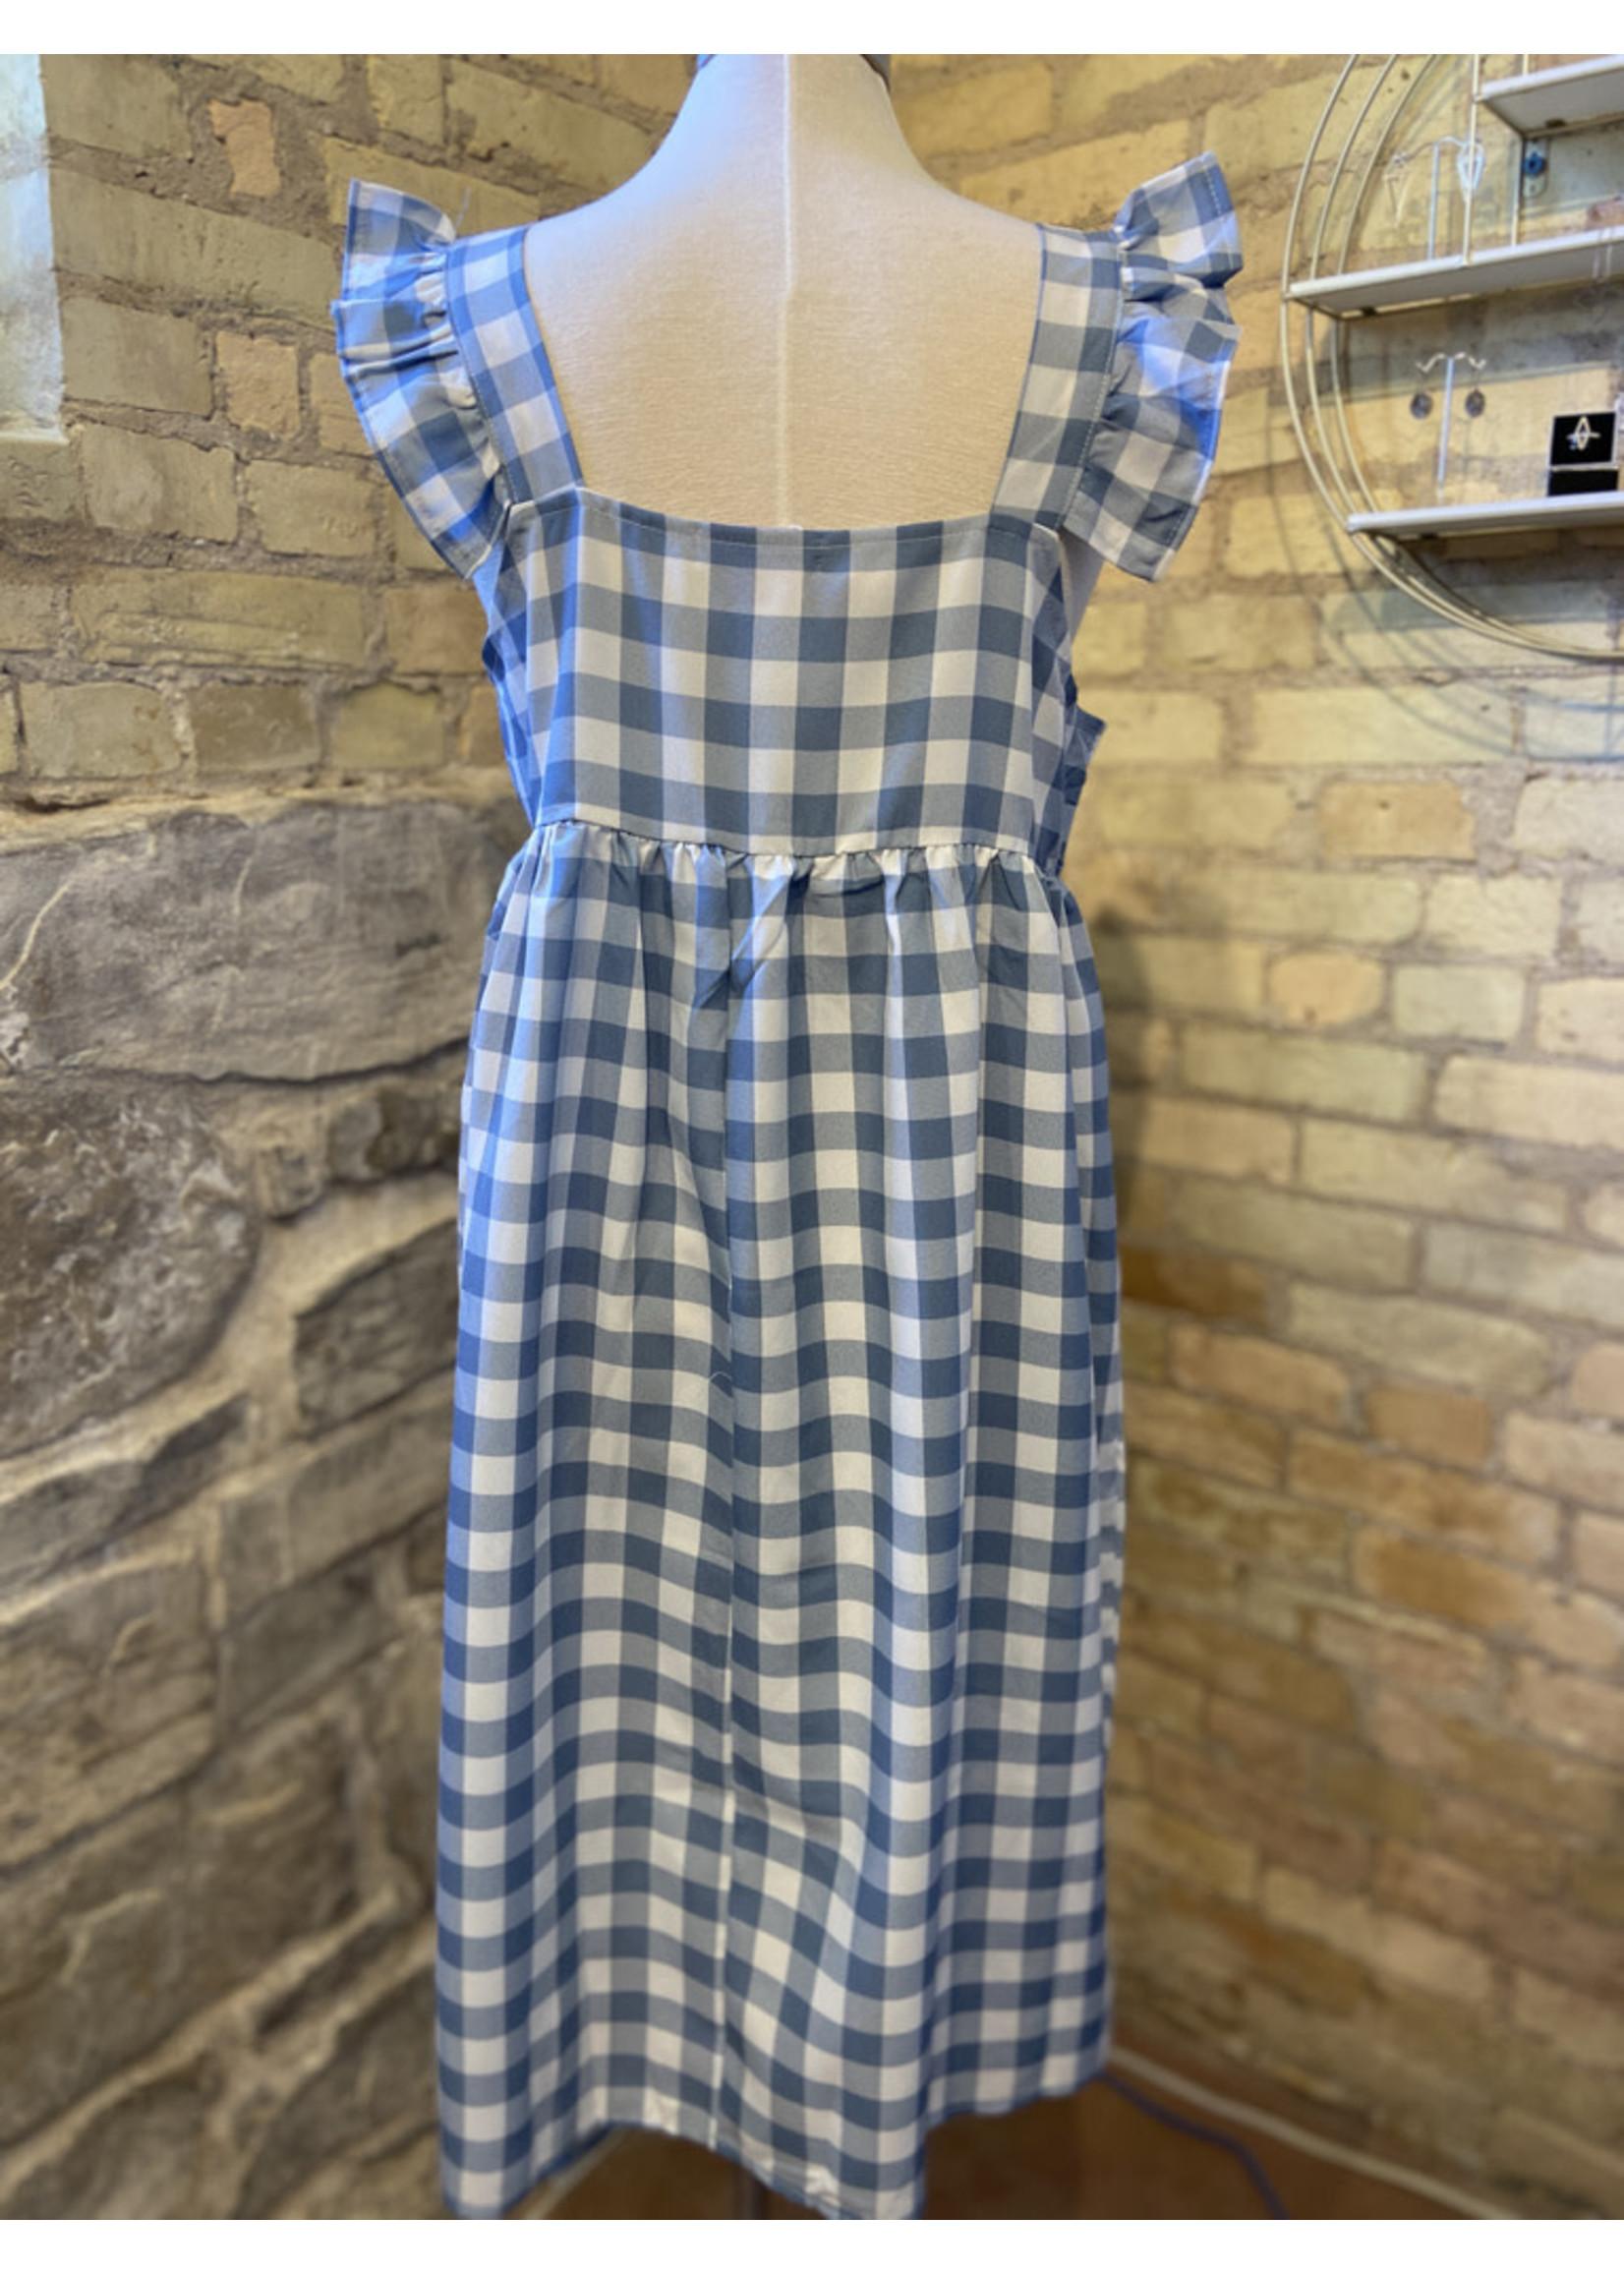 Esley Plaid Baby Doll Dress